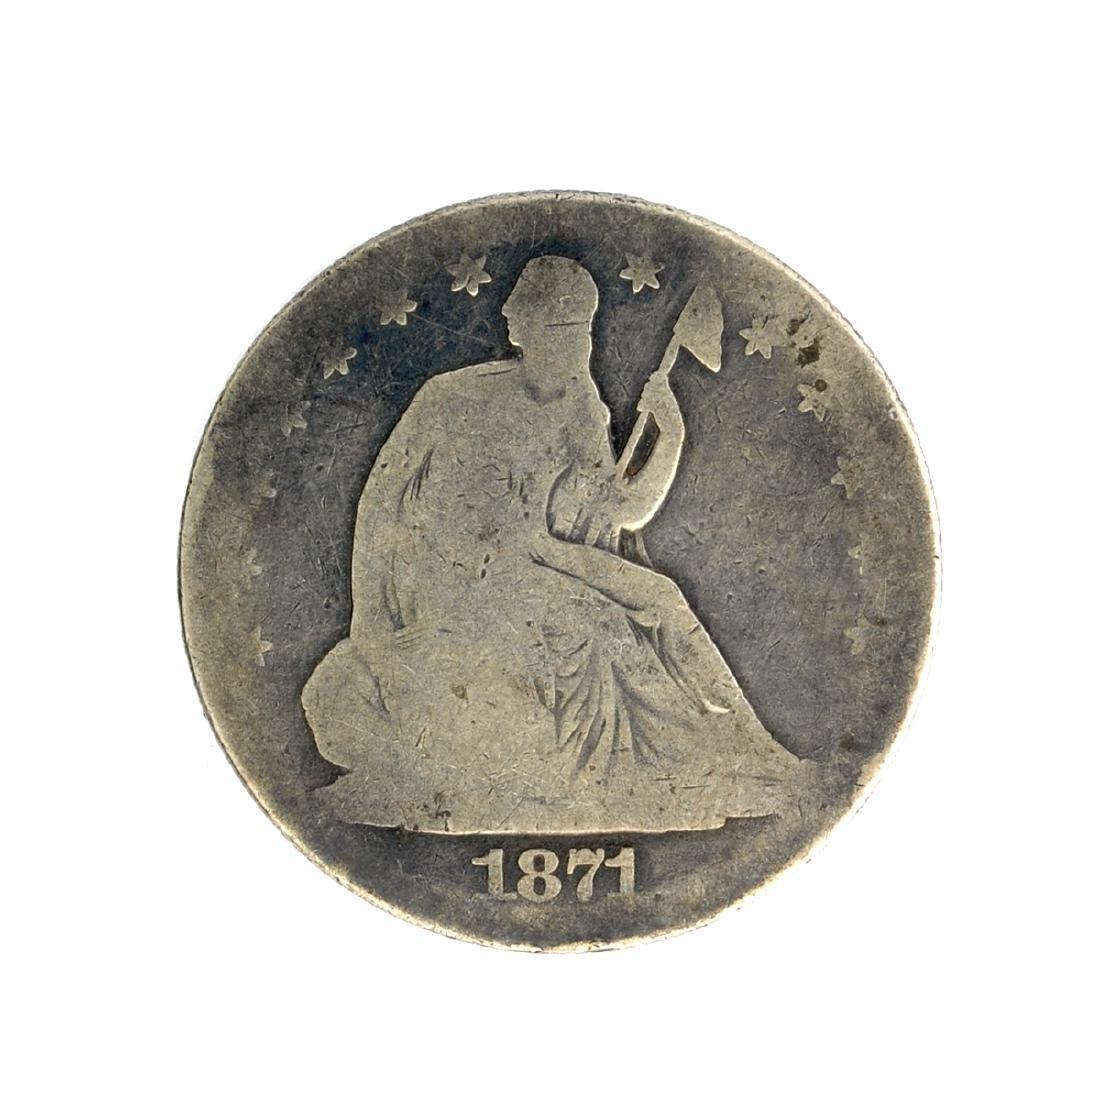 1871 Liberty Seated Half Dollar Coin